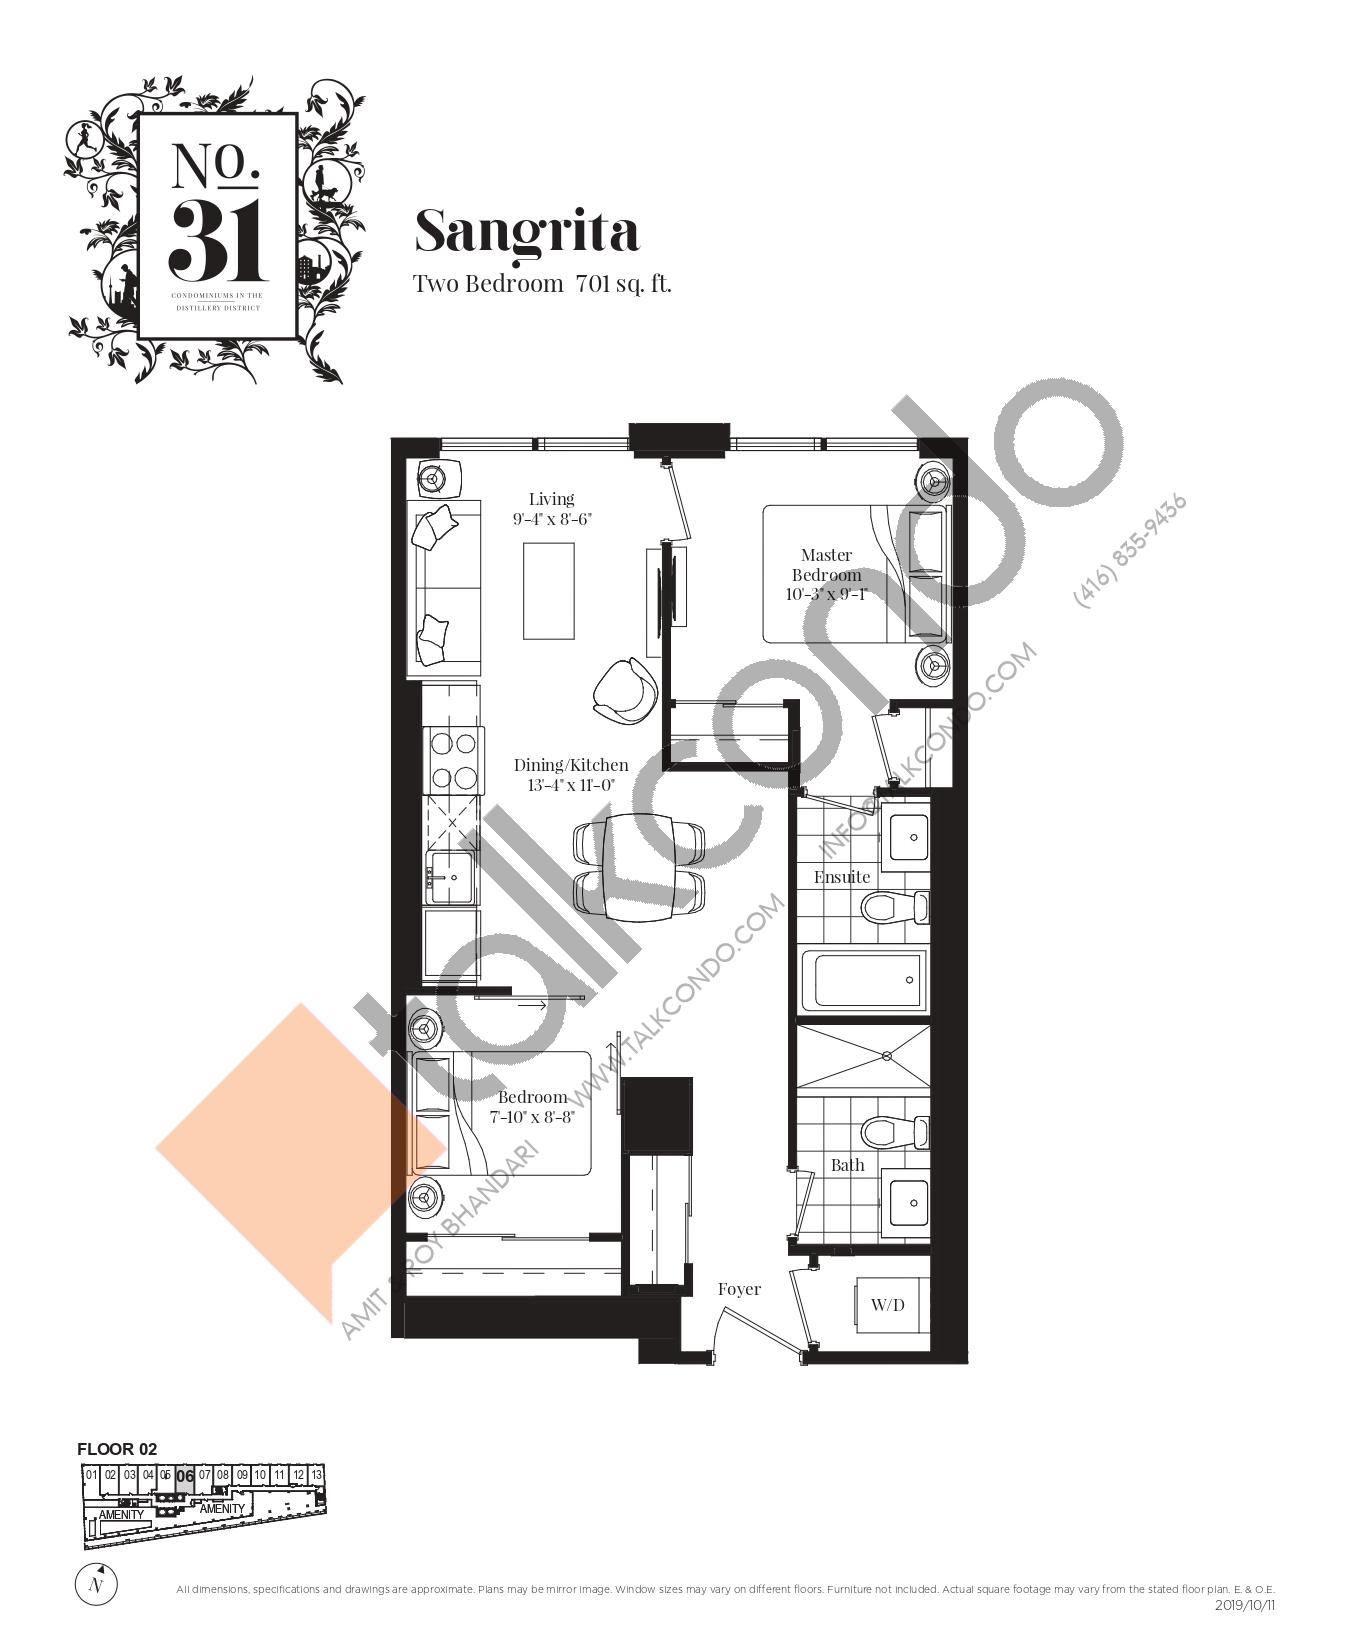 Sangrita Floor Plan at No. 31 Condos - 701 sq.ft